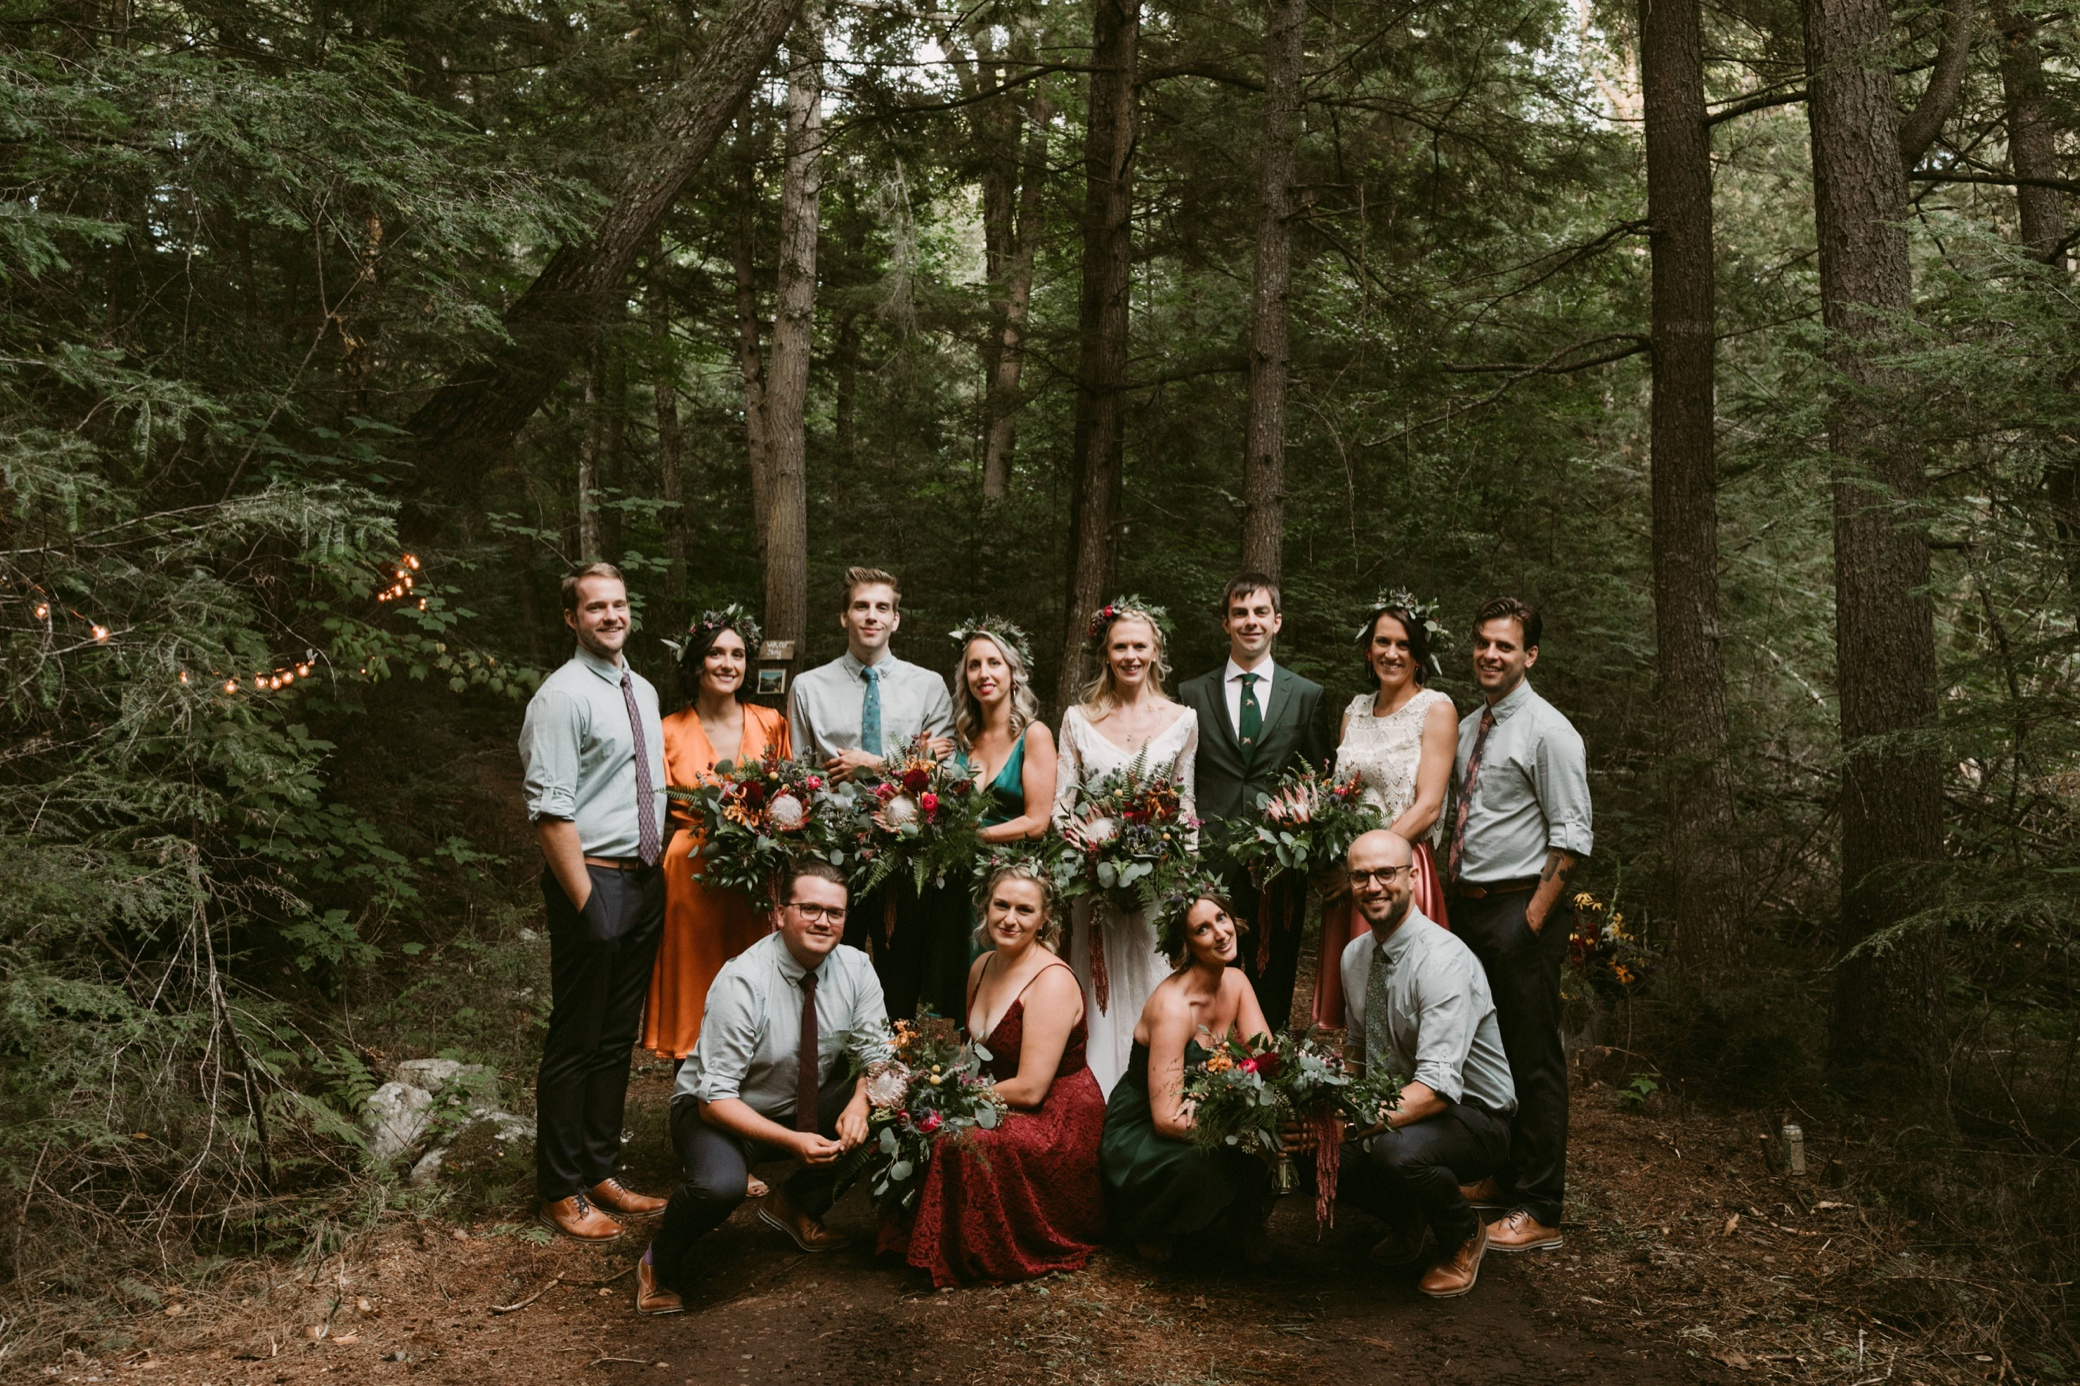 113_Huntsville Wedding  (523 of 689)_Forest_Ontario_Cottage_Huntsville_Algonquin_Wedding.jpg